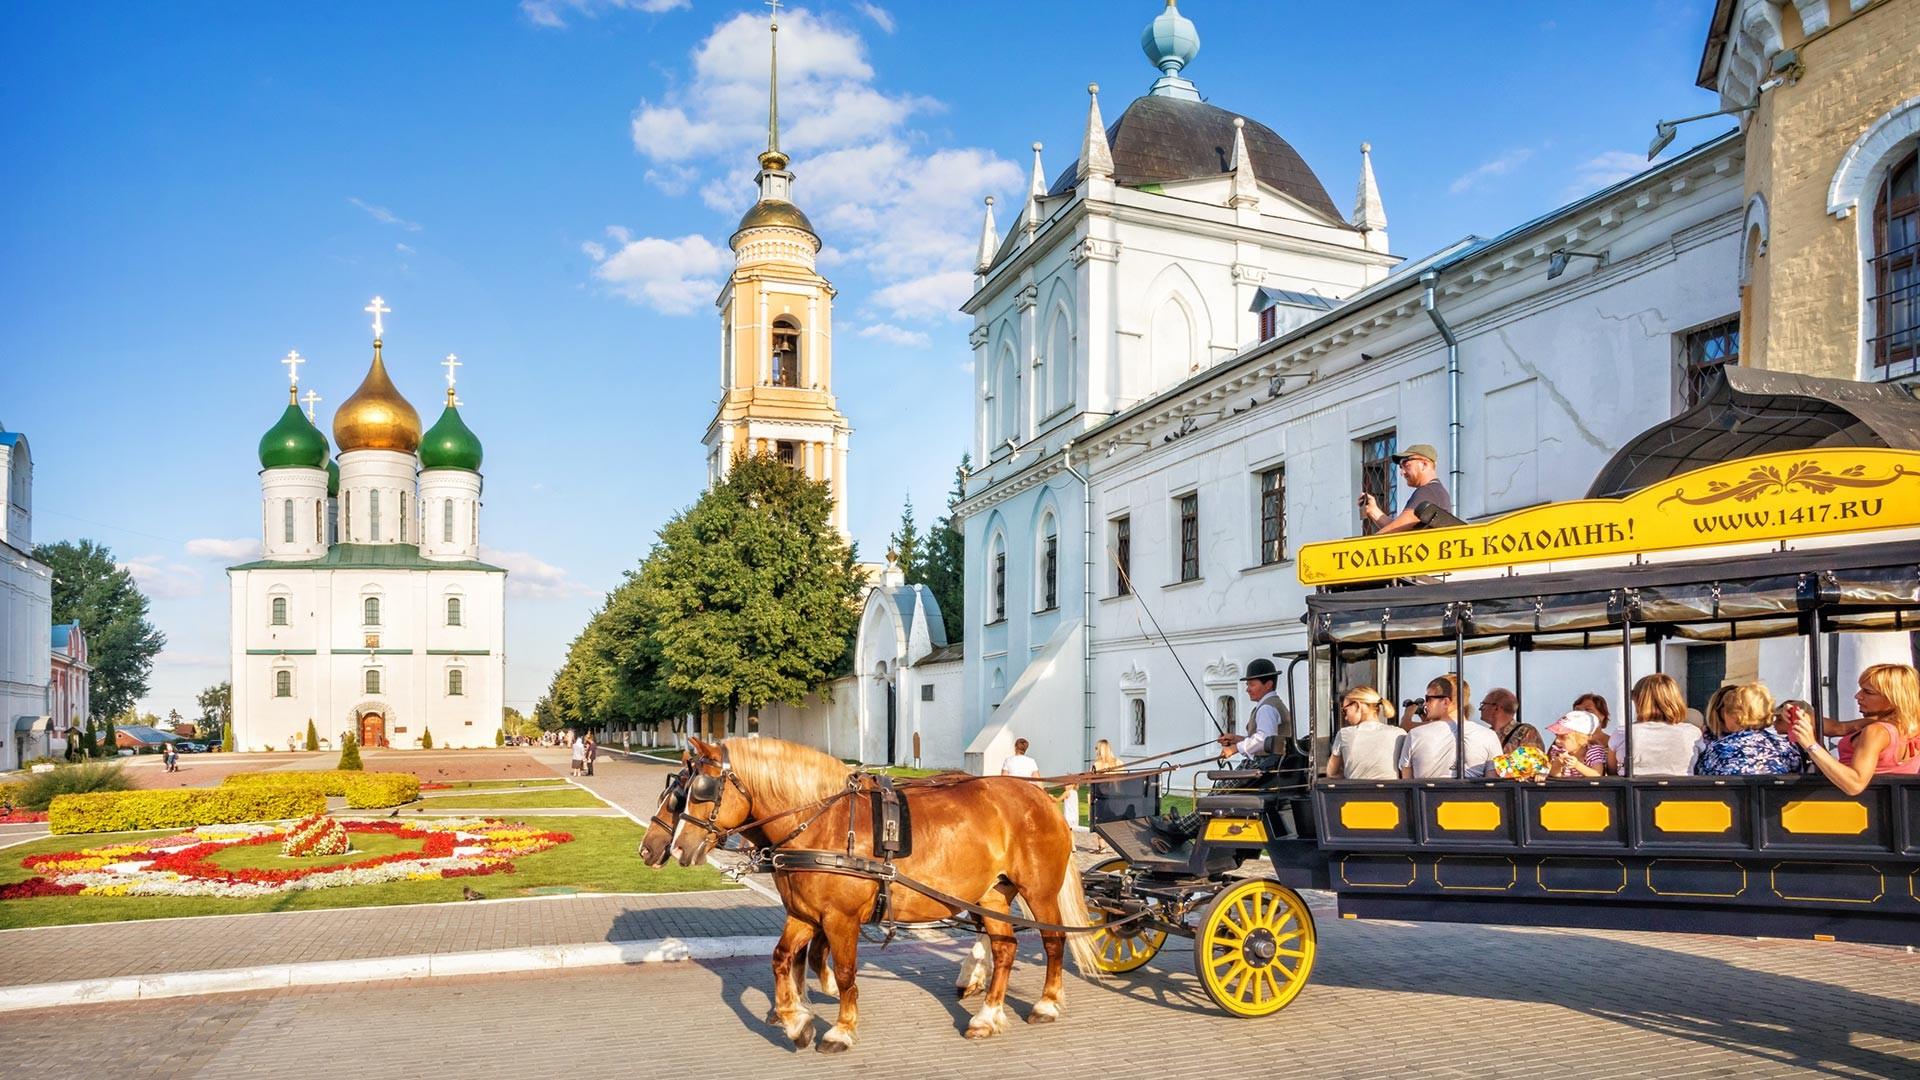 Inside the Kolomna kremlin